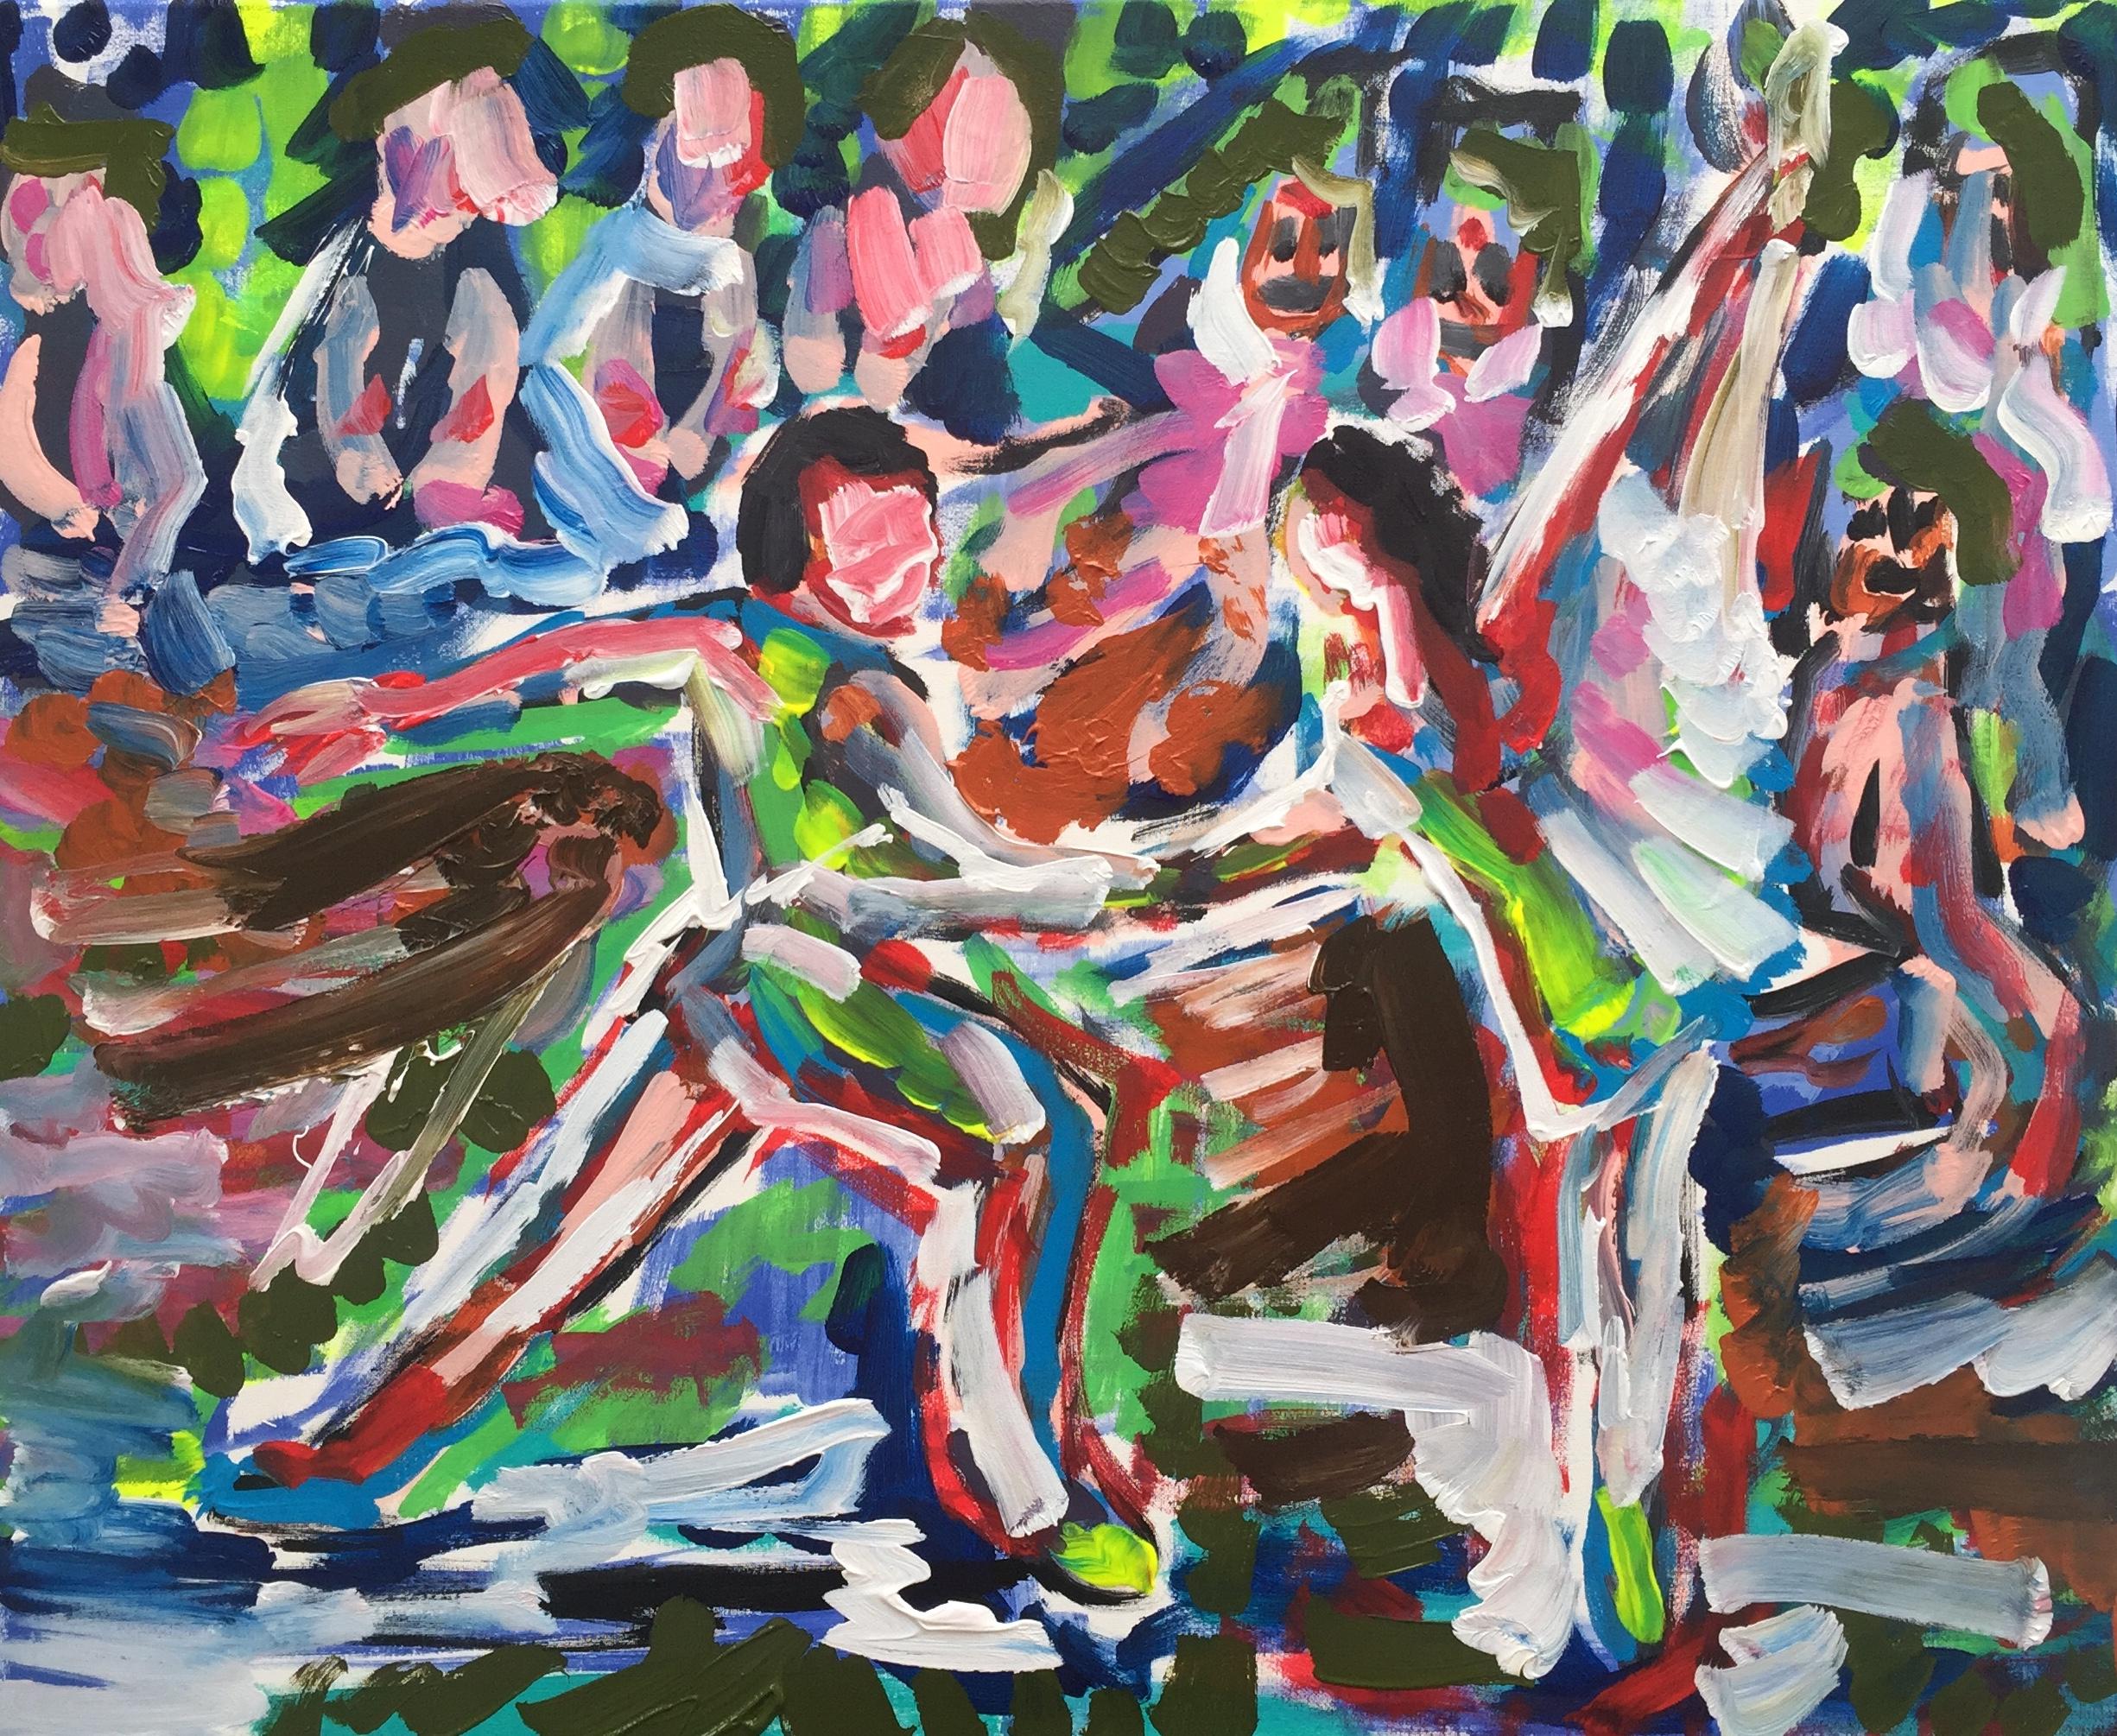 Dancing set me free, acrylic on canvas, cm 50 x cm 60, Occhiobello, 2020